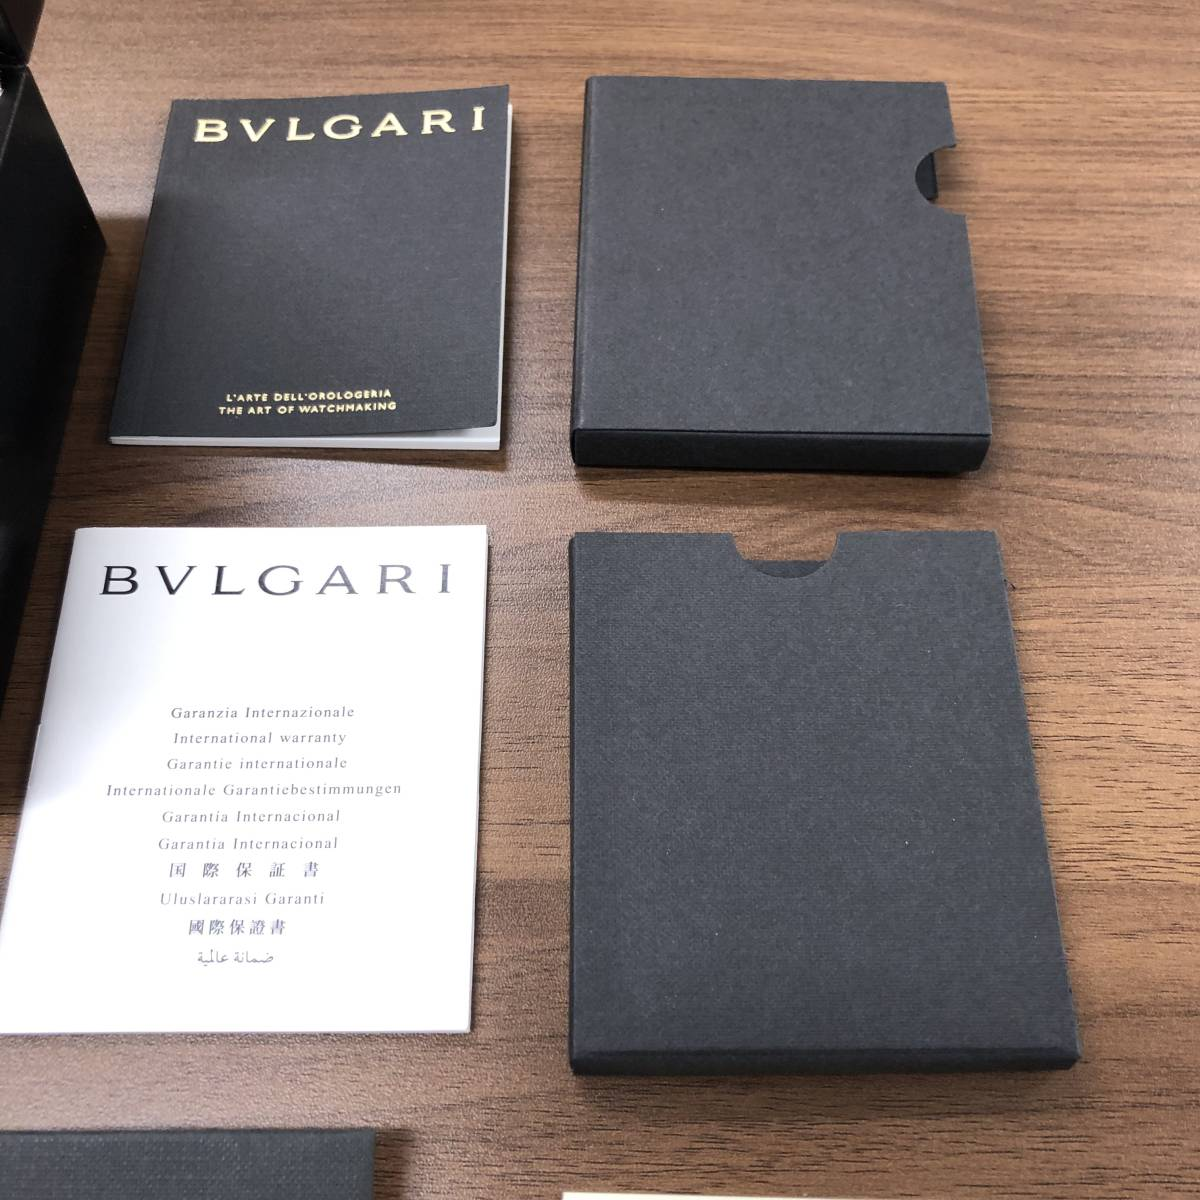 【2459】 BVLGARI ブルガリ 腕時計用ケース 空箱 冊子一式 黒_画像2